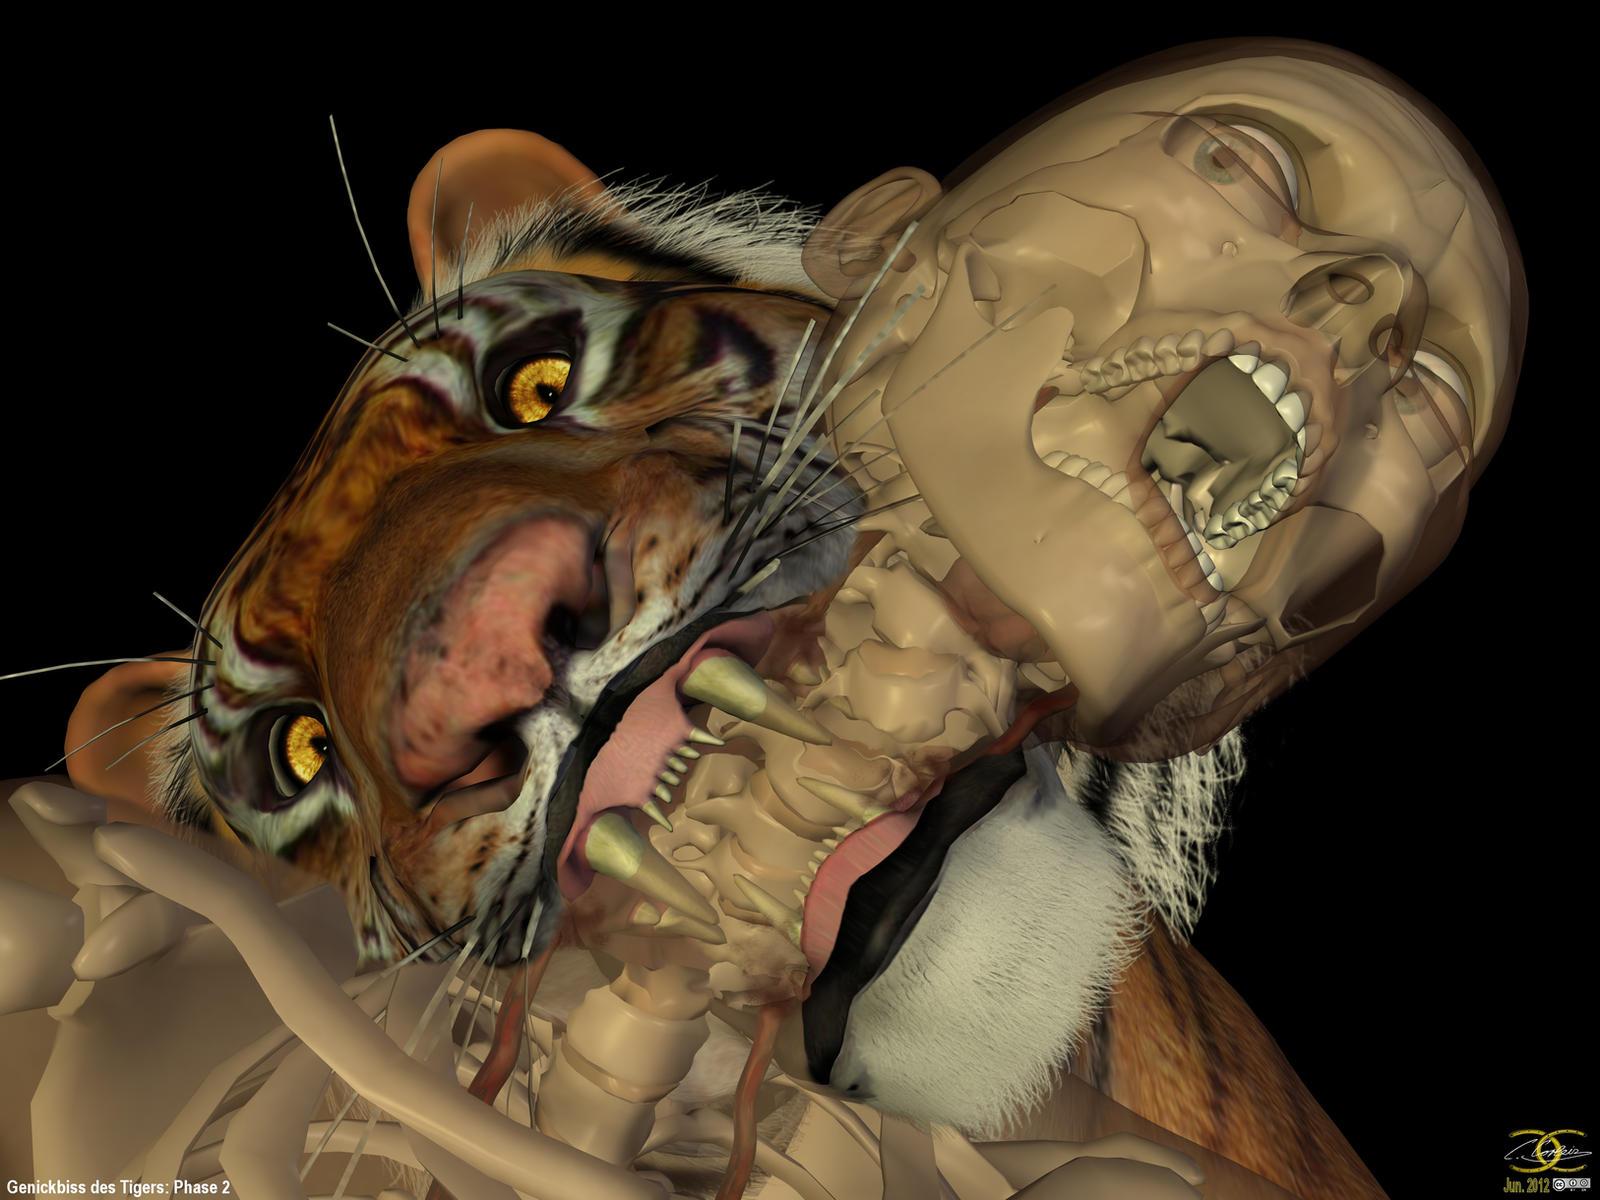 Neck bite of a Tiger: Phase 2 by ancestorsrelic